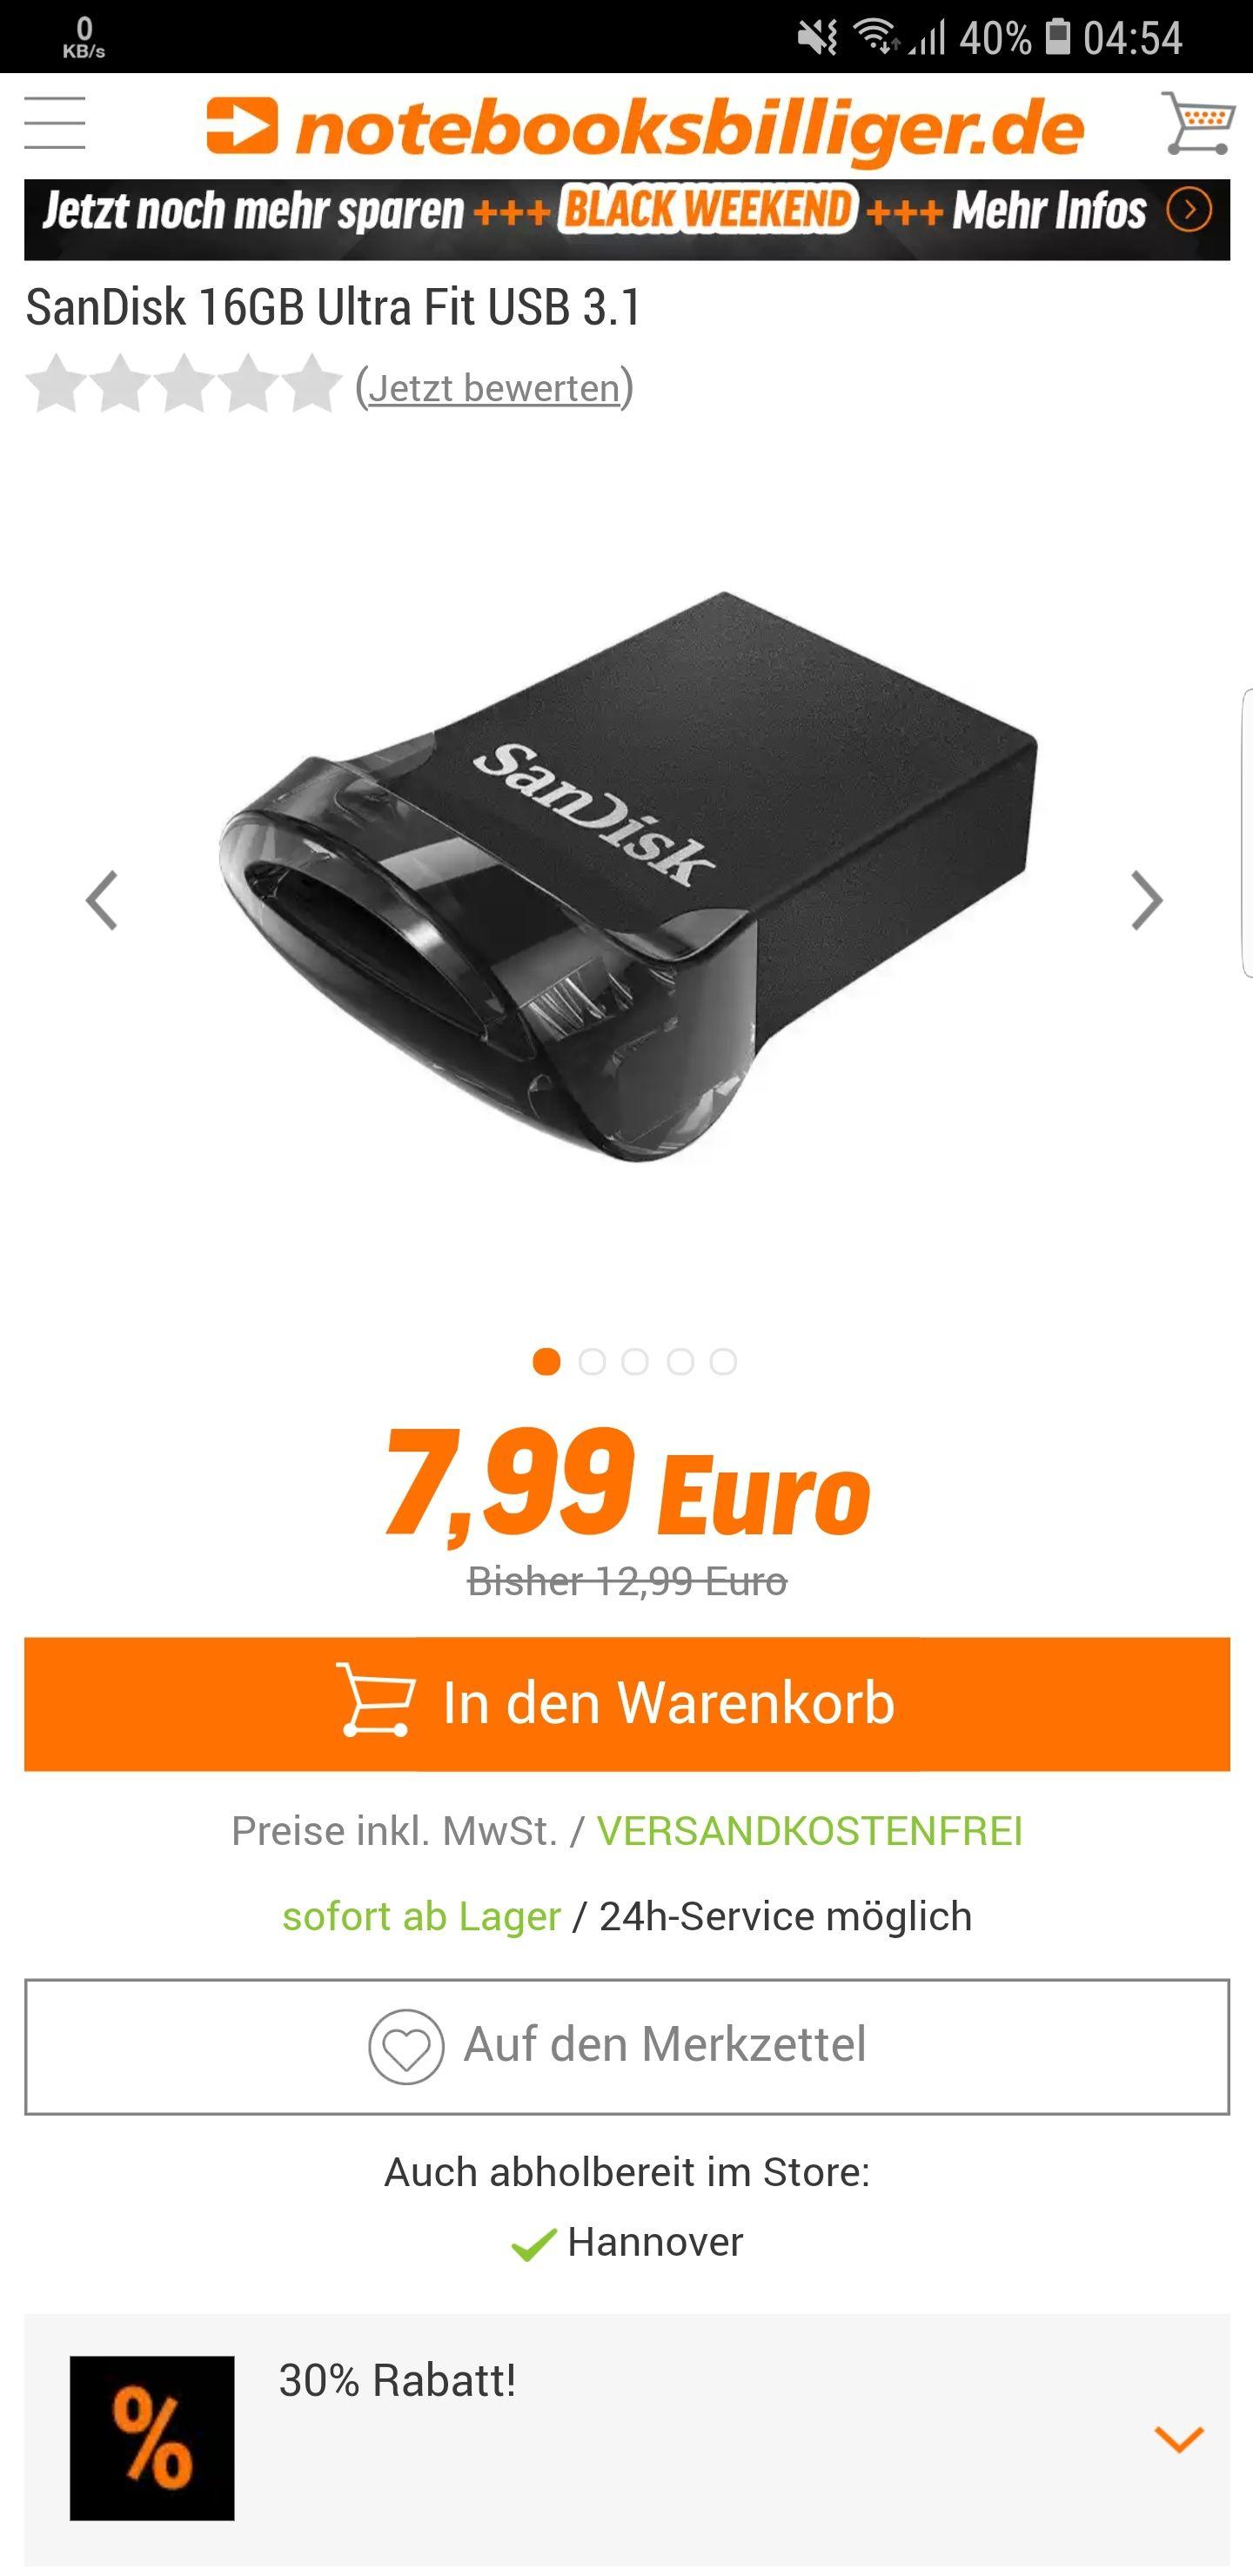 San Disk 16gb Ultra Fit  Usb Stick 3.1 bei Notebooksbilliger (Gutscheincode)